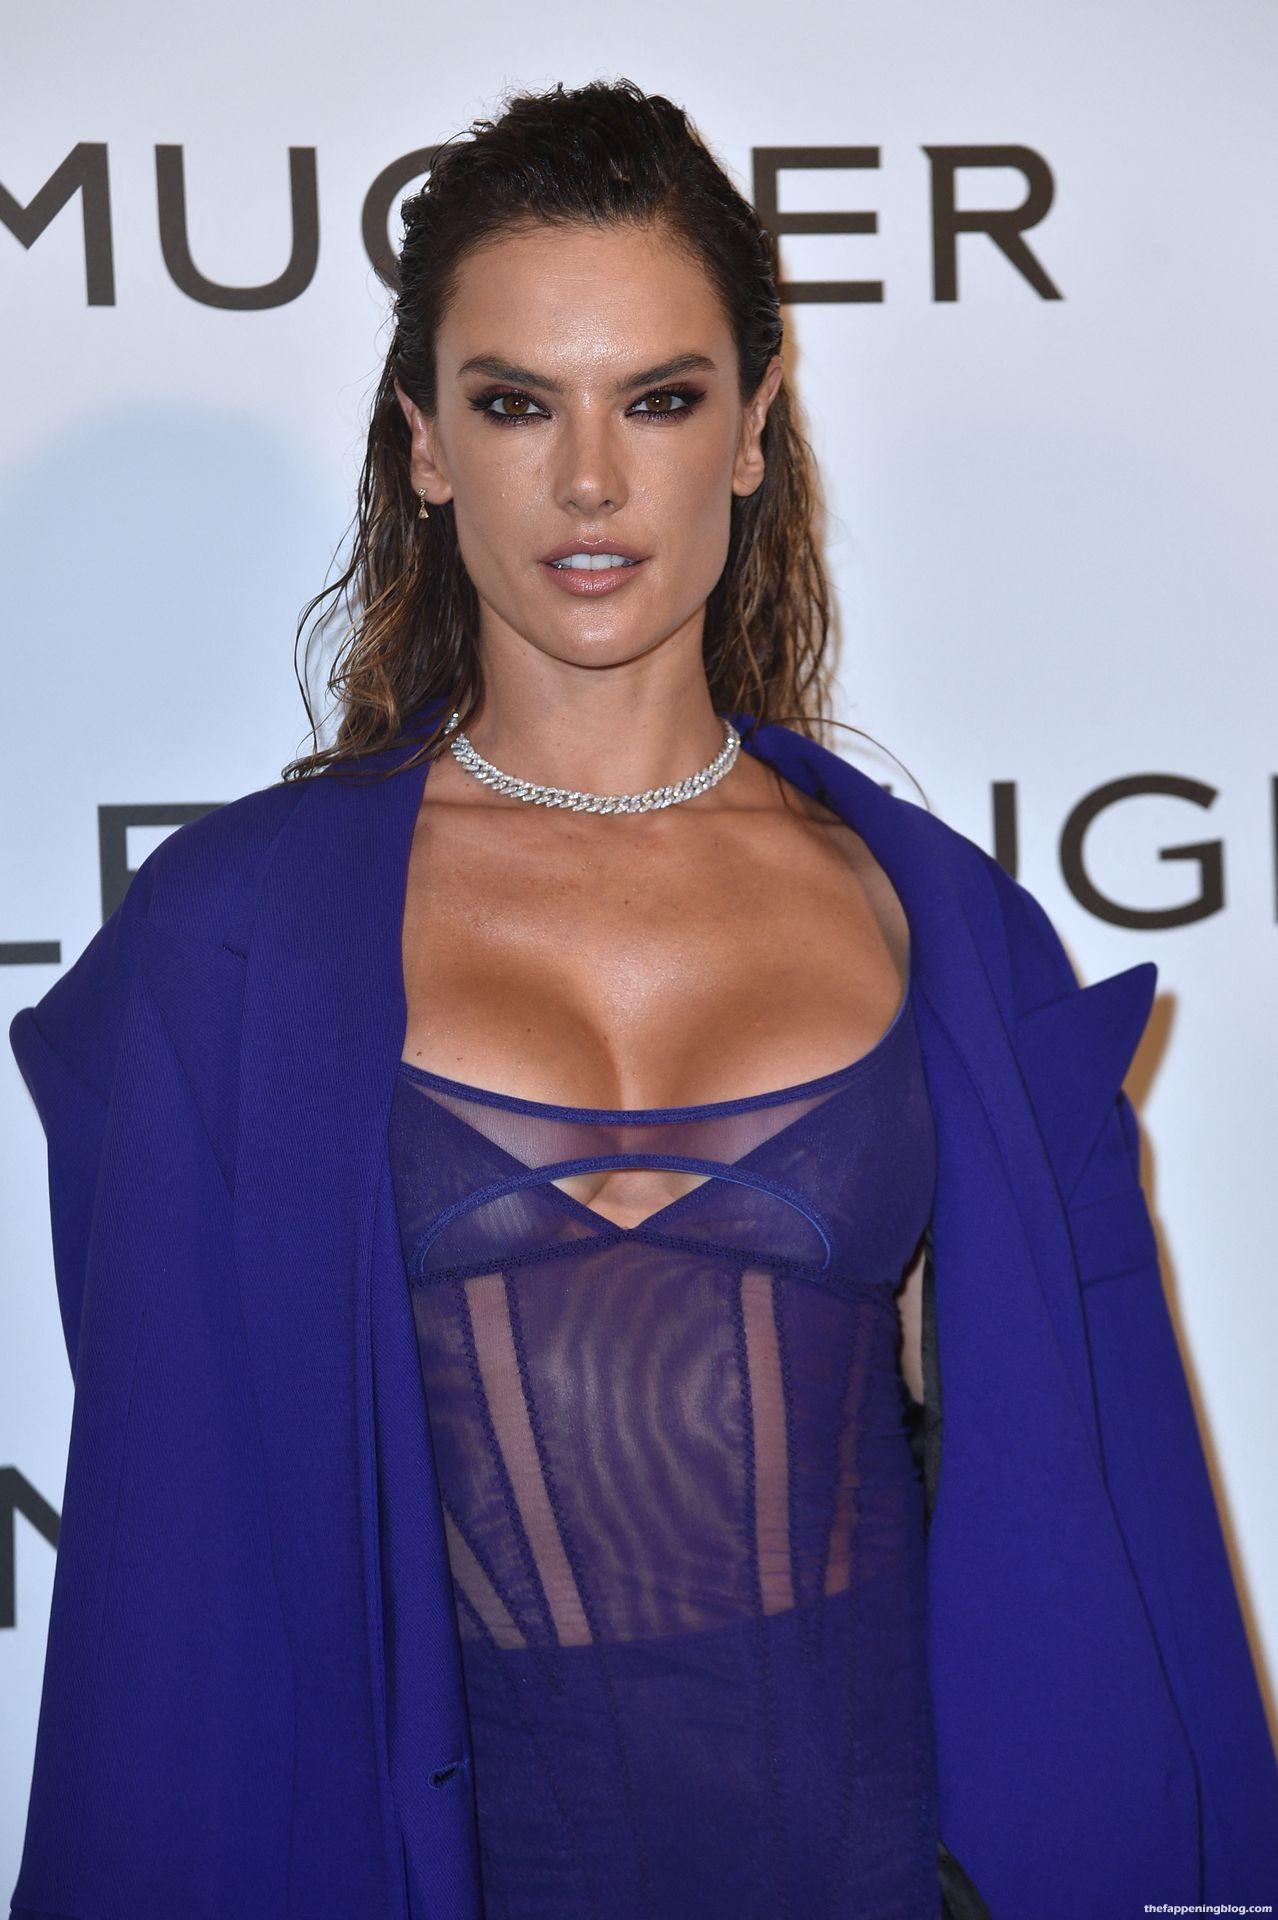 Alessandra-Ambrosio-Sexy-The-Fappening-Blog-4-4.jpg